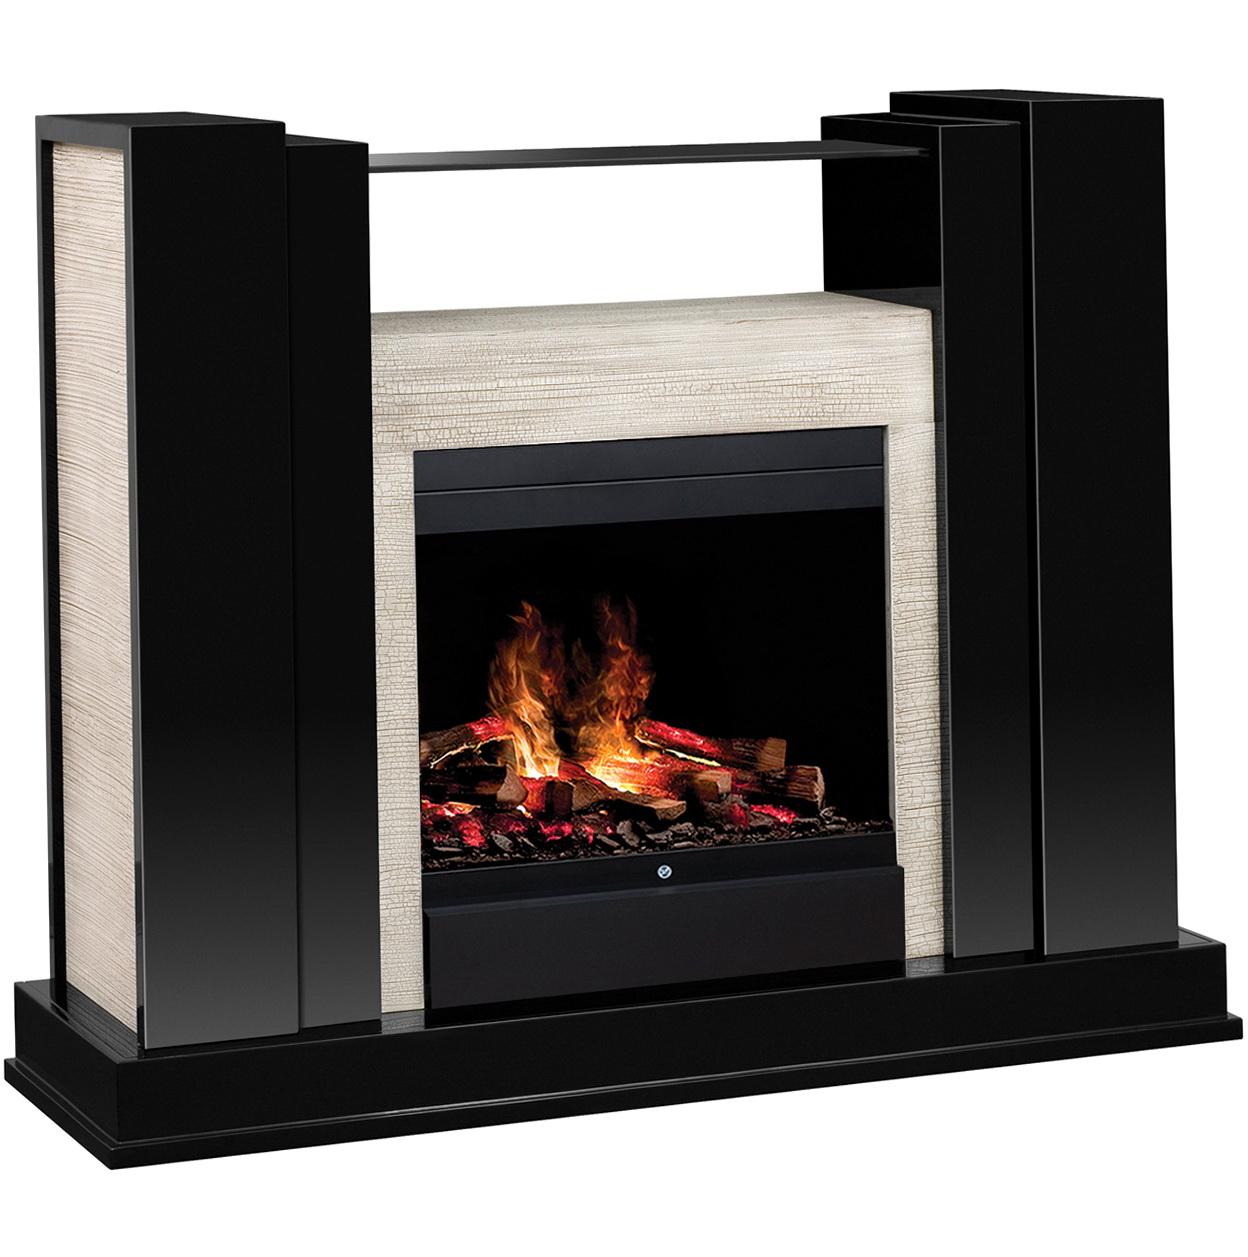 Strange Dimplex Optimyst Electric Fireplace Cassette Insert W Rocks Home Interior And Landscaping Palasignezvosmurscom